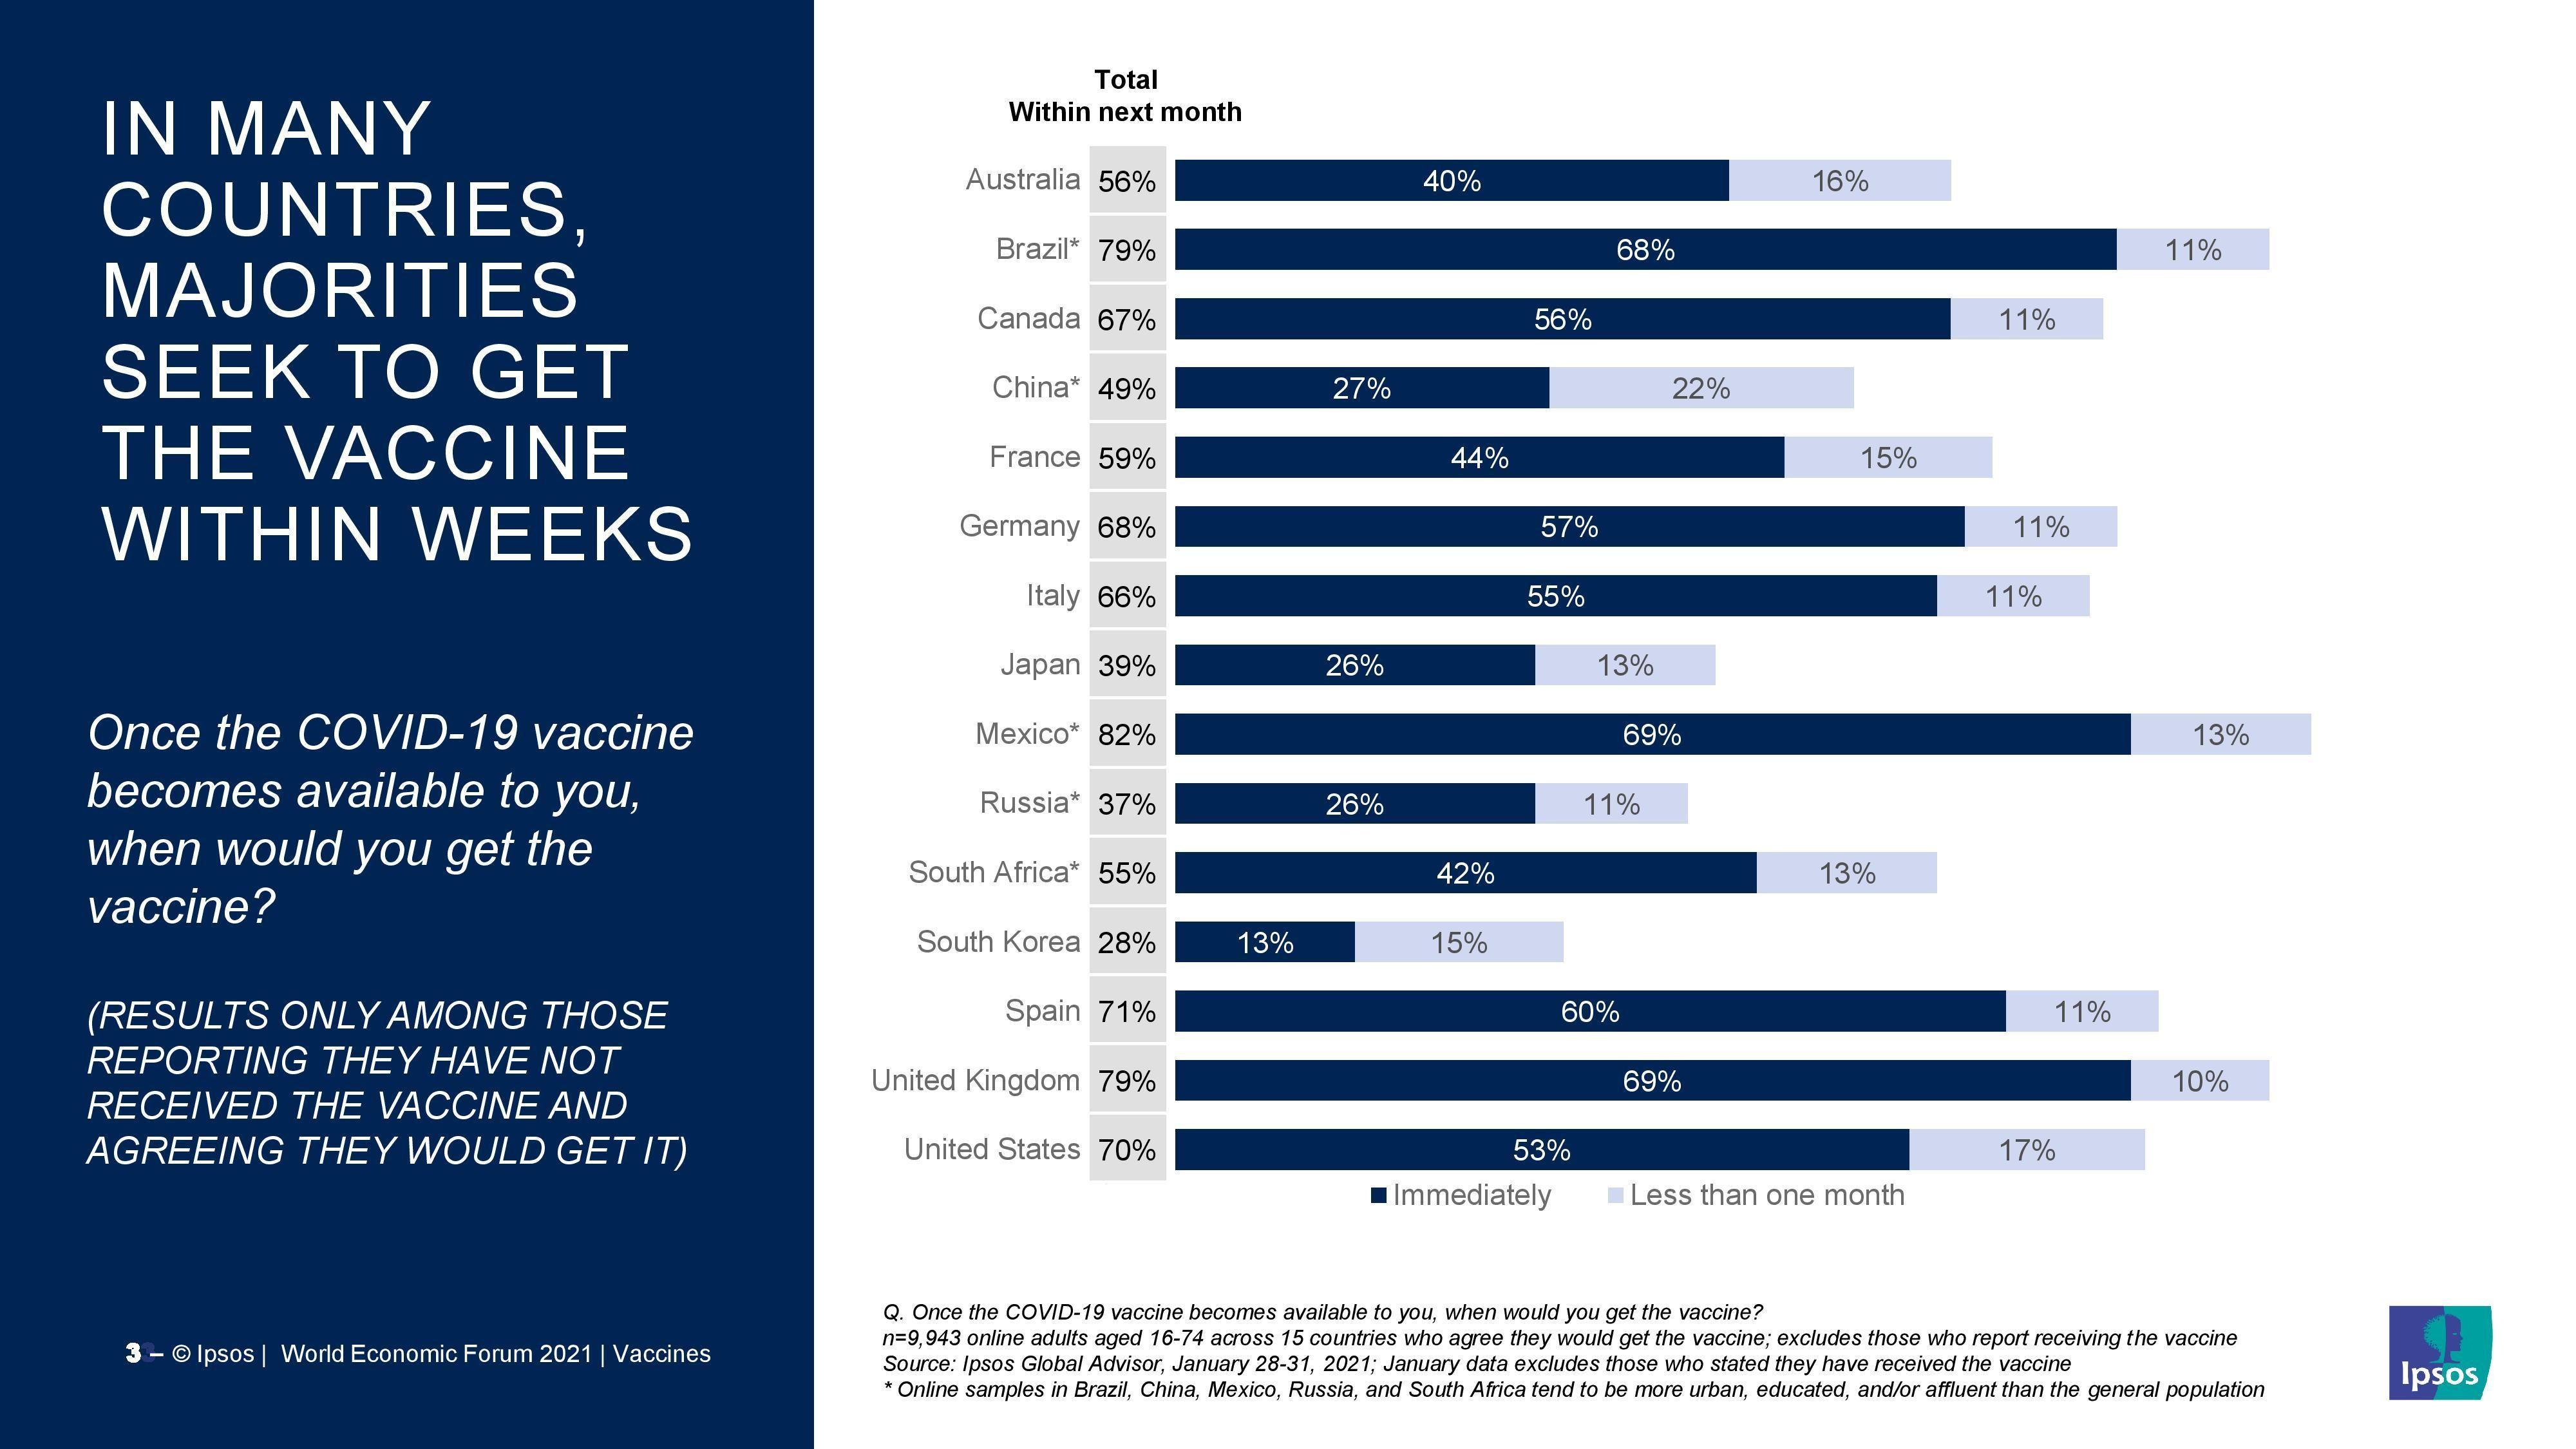 In many countries, majorities seek to get the vaccine within weeks.